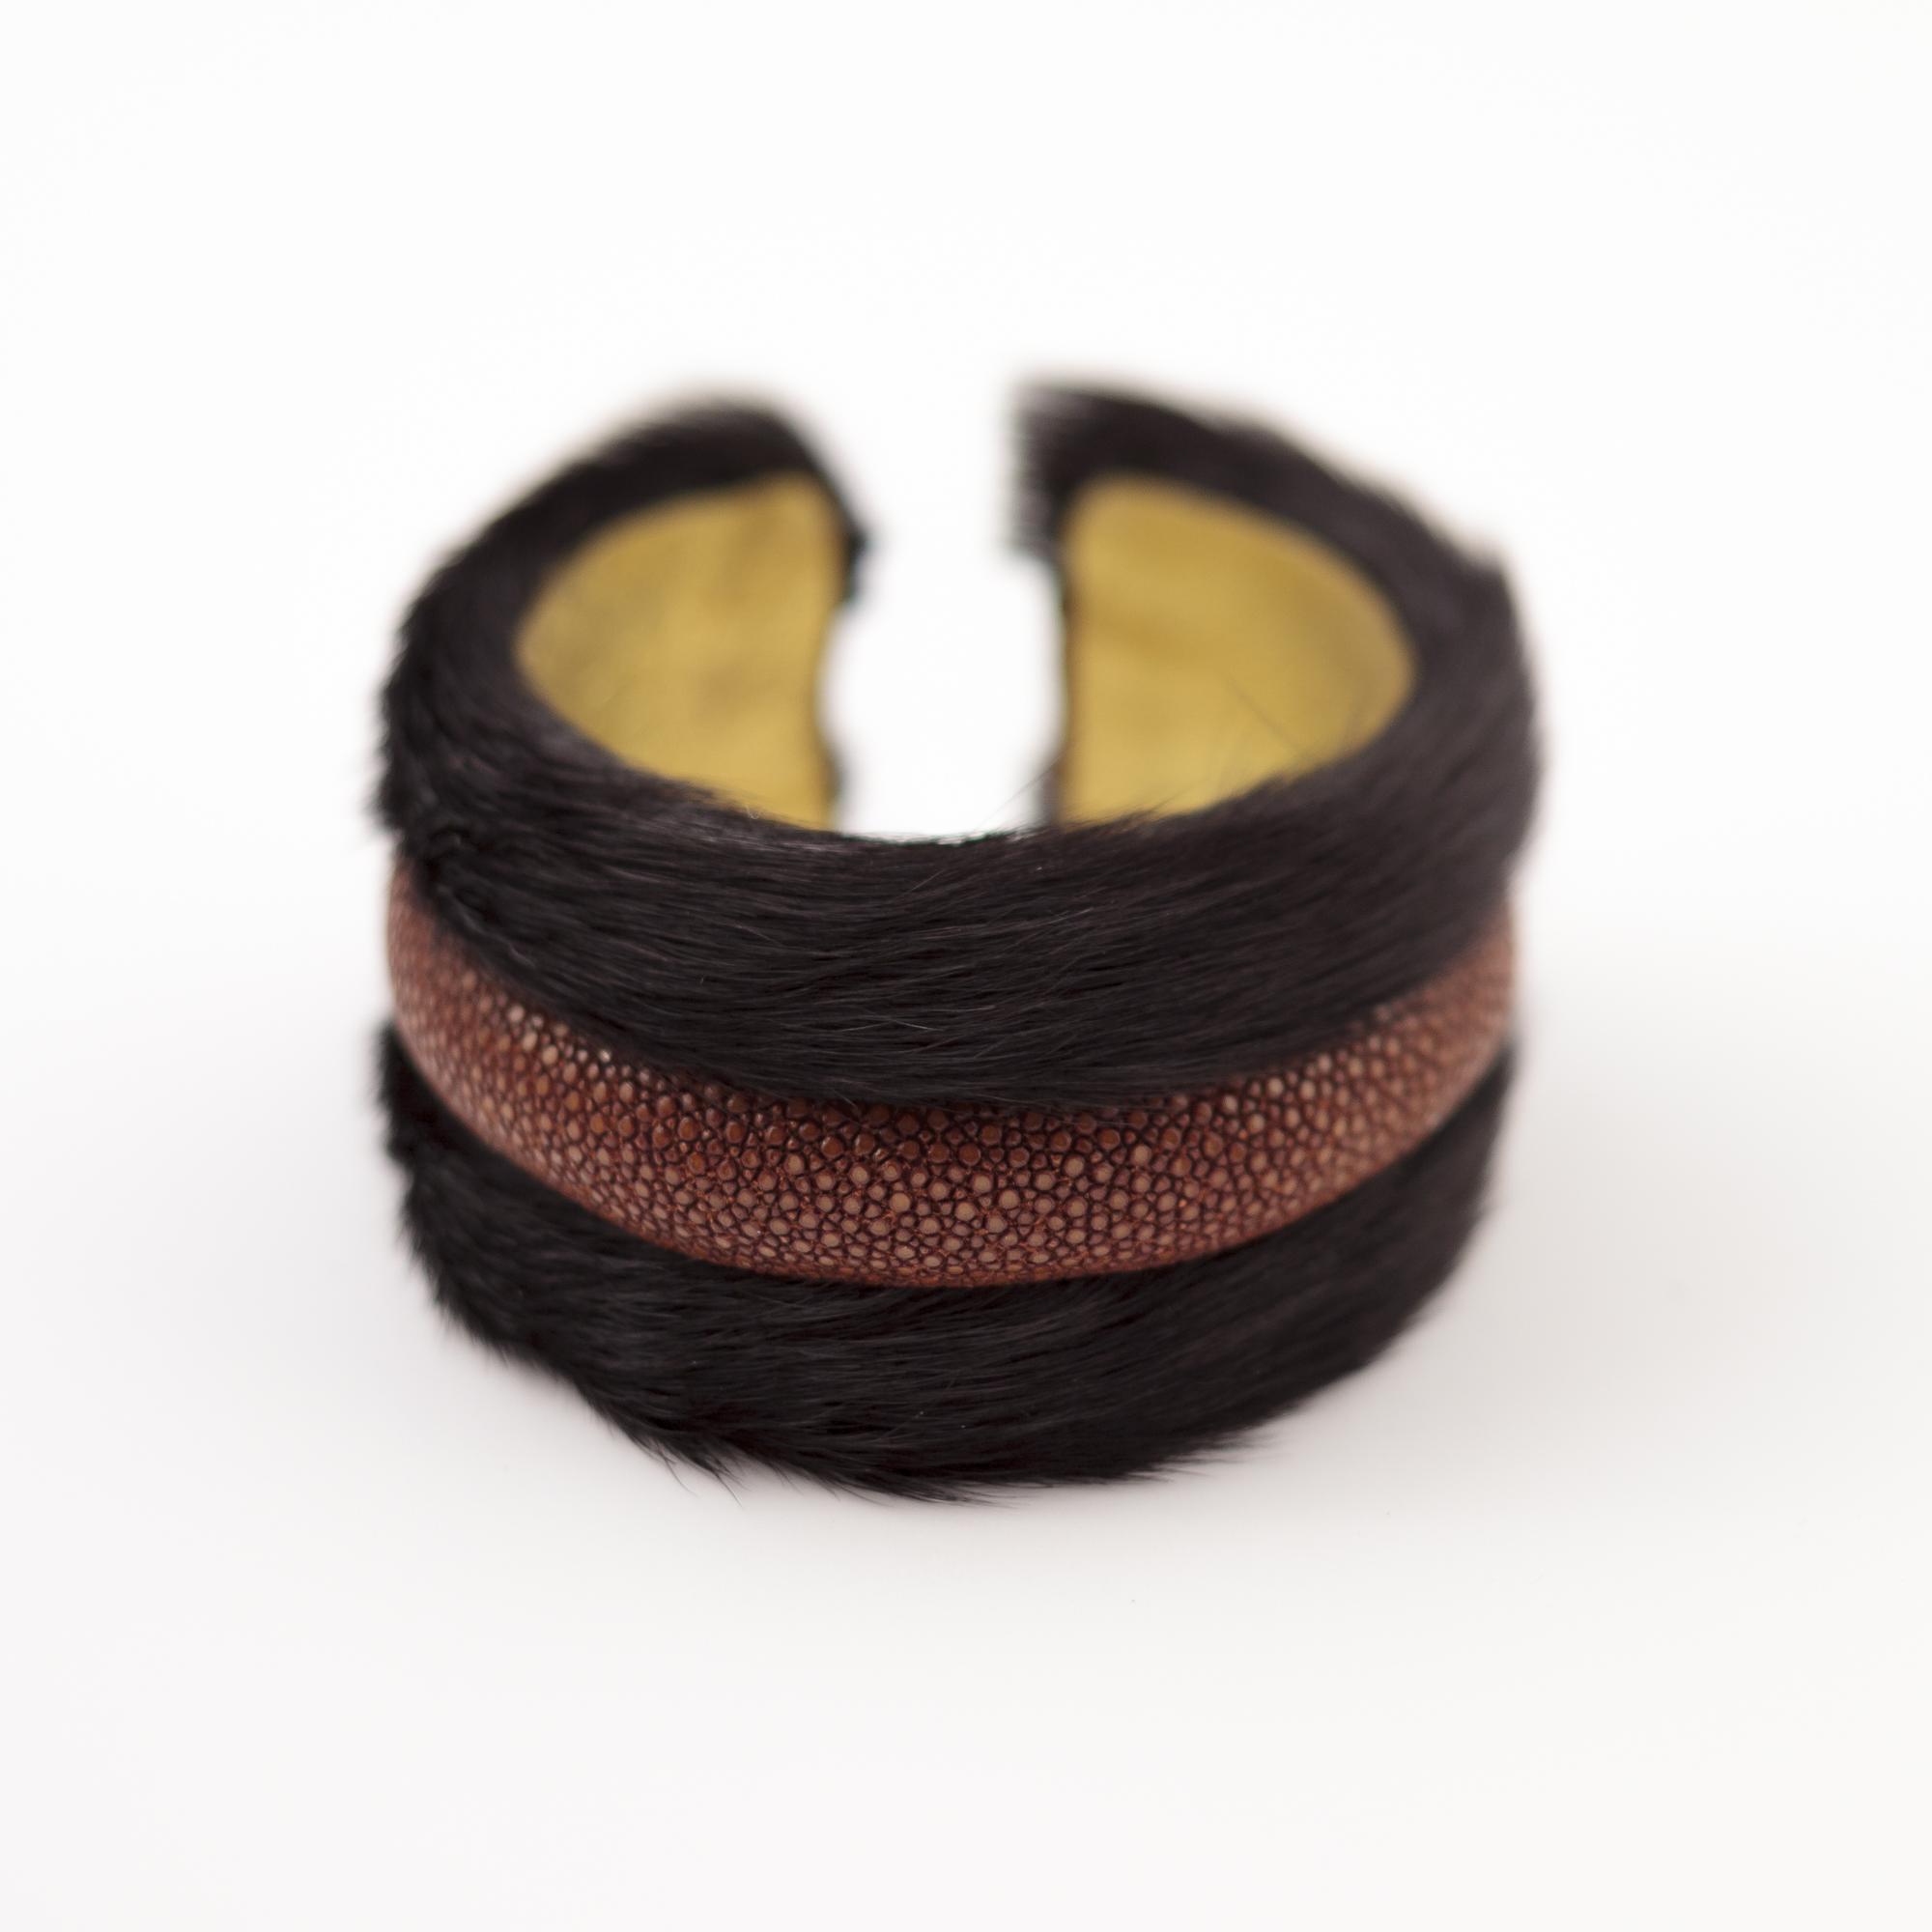 tresor-by-flore-galuchat-bracelet-poilu-brun-caramel